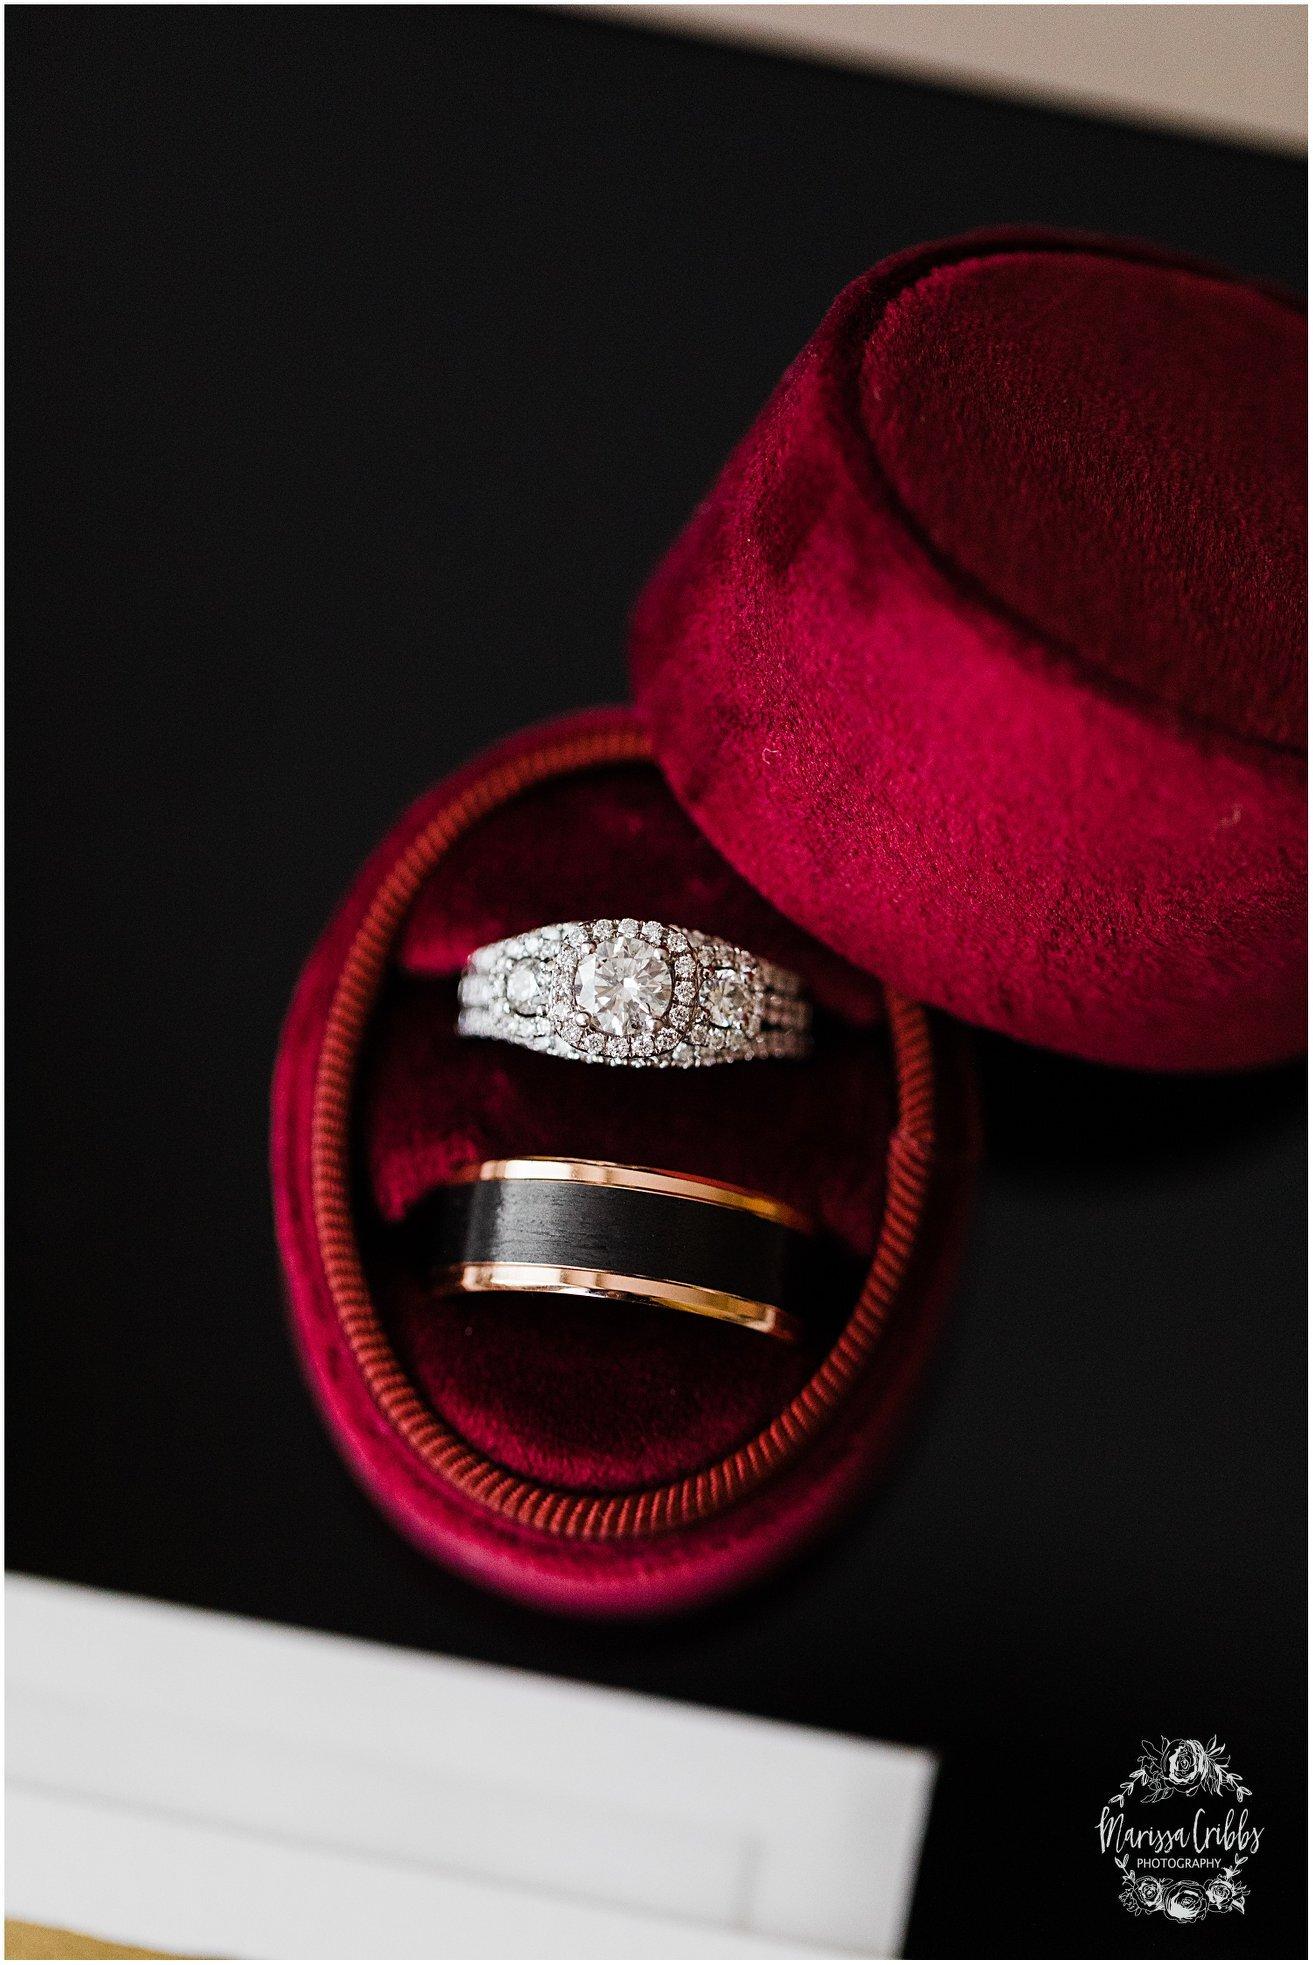 Wedding Rings - Marrisa Cribbs Photography